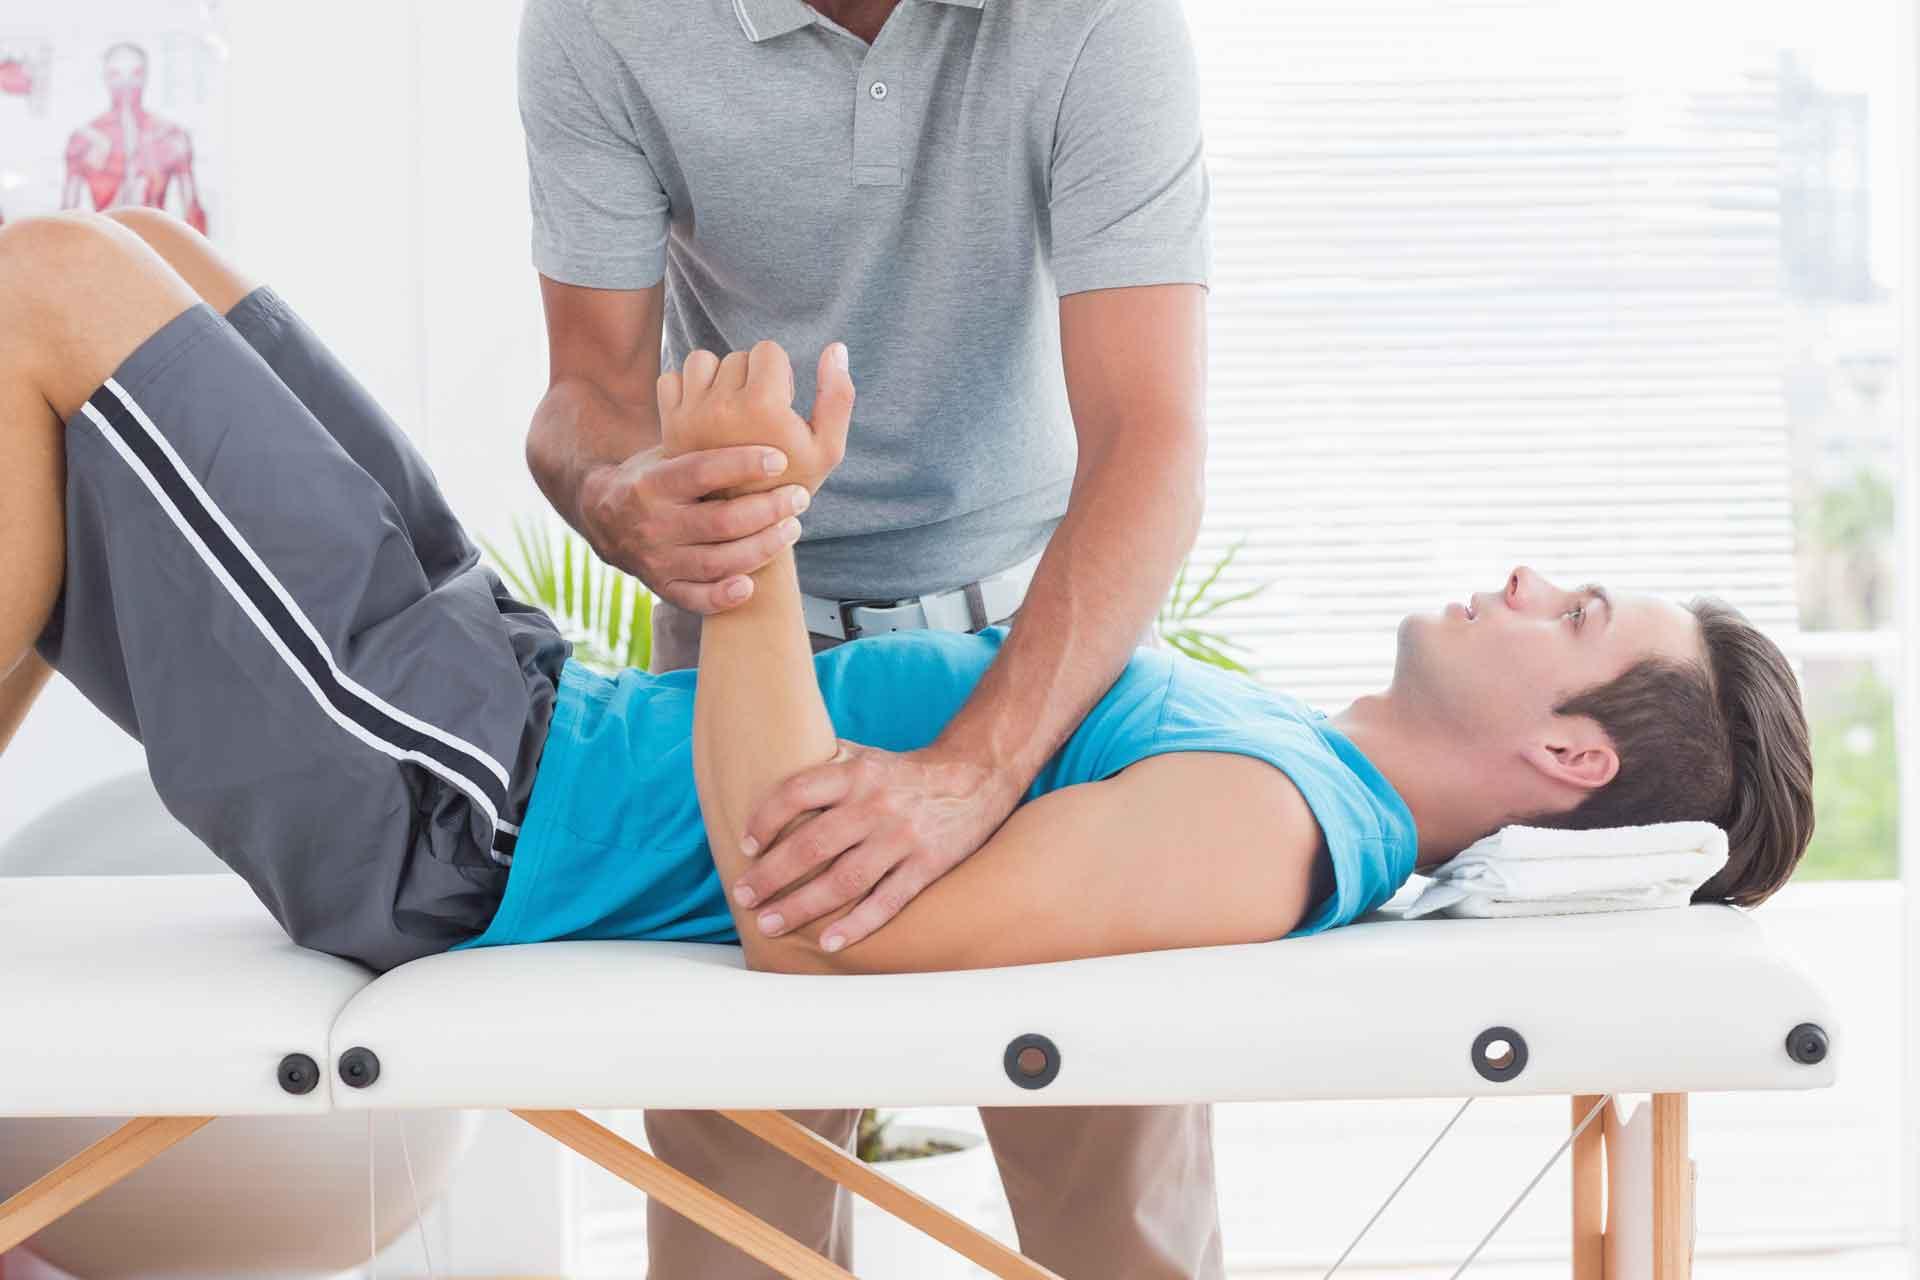 A registered massage therapist massages the right arm of a man richmond rmt massage